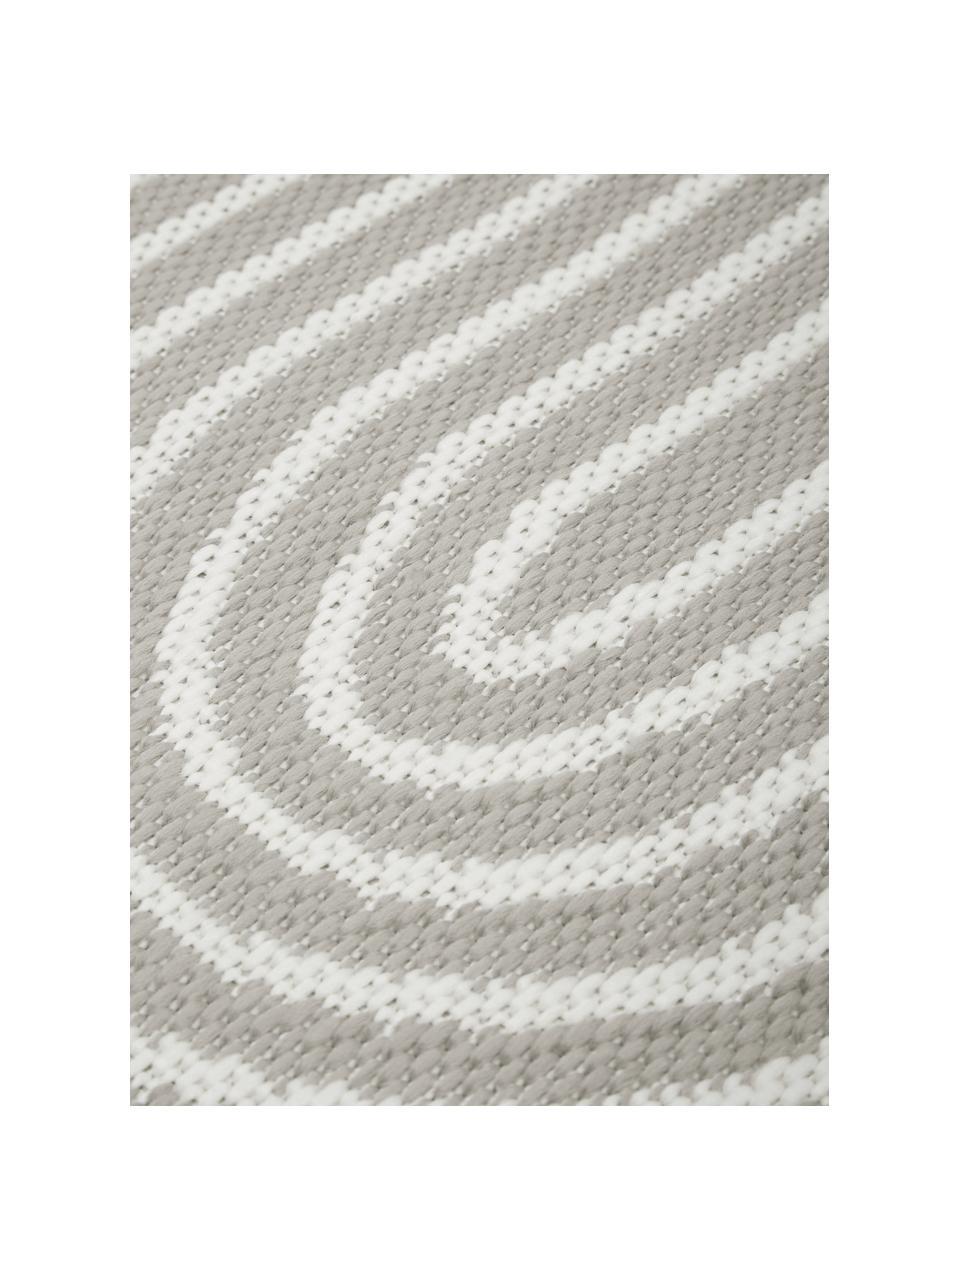 In- & outdoor vloerkleed Arches in grijs/wit, 86% polypropyleen, 14% polyester, Grijs, wit, B 200 x L 290 cm (maat L)